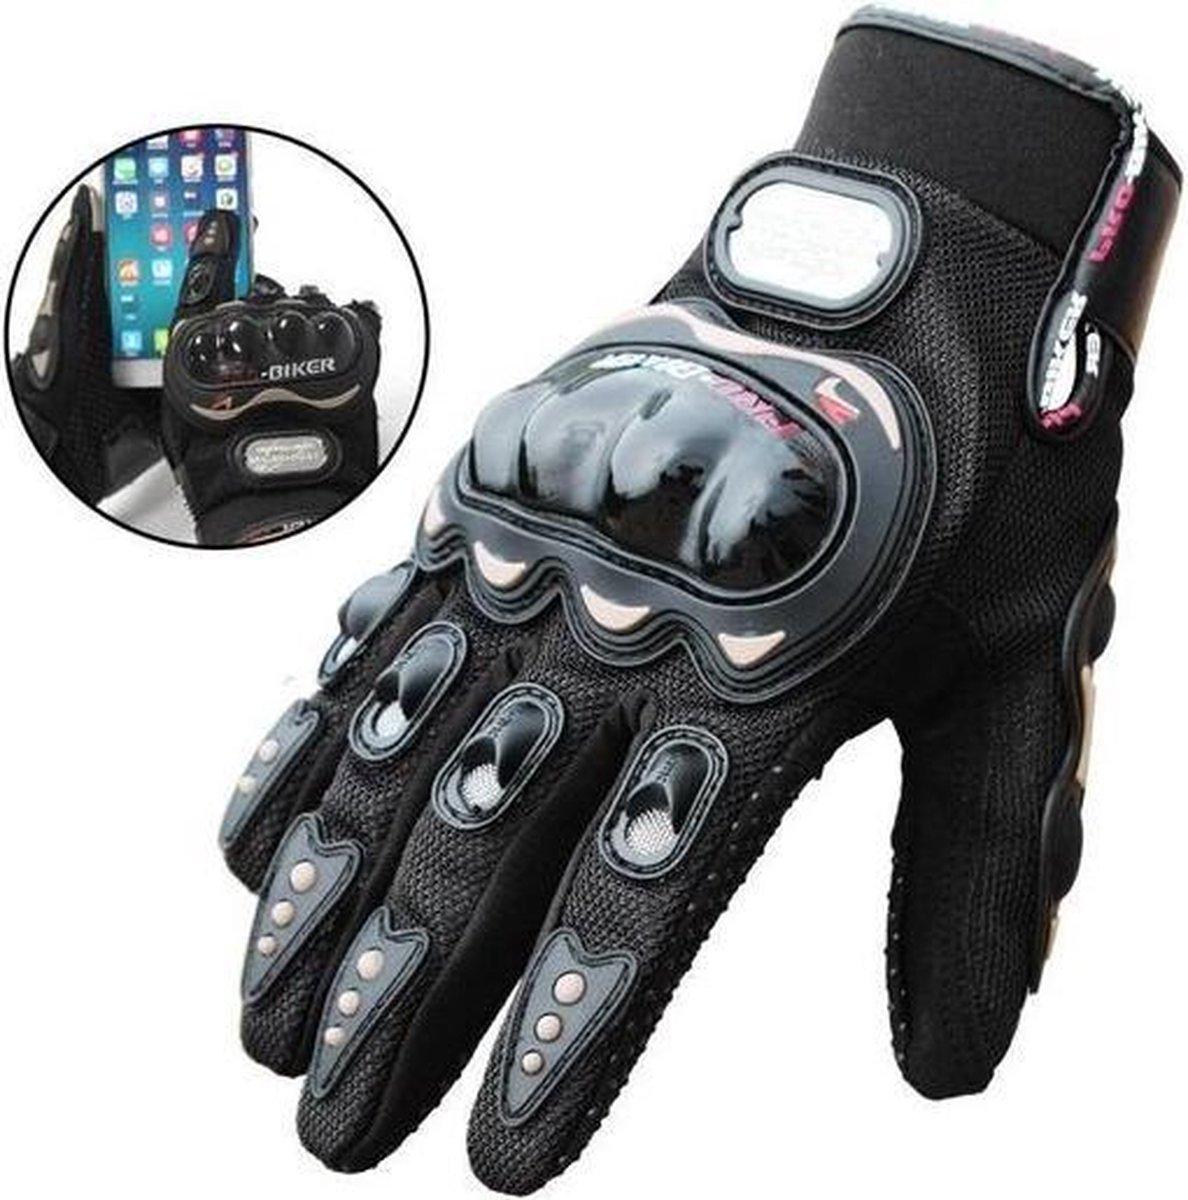 Motorhandschoenen - Zwart - Handschoenen Motor & Scooter - Maat XL - Touchscreen - Bescherming